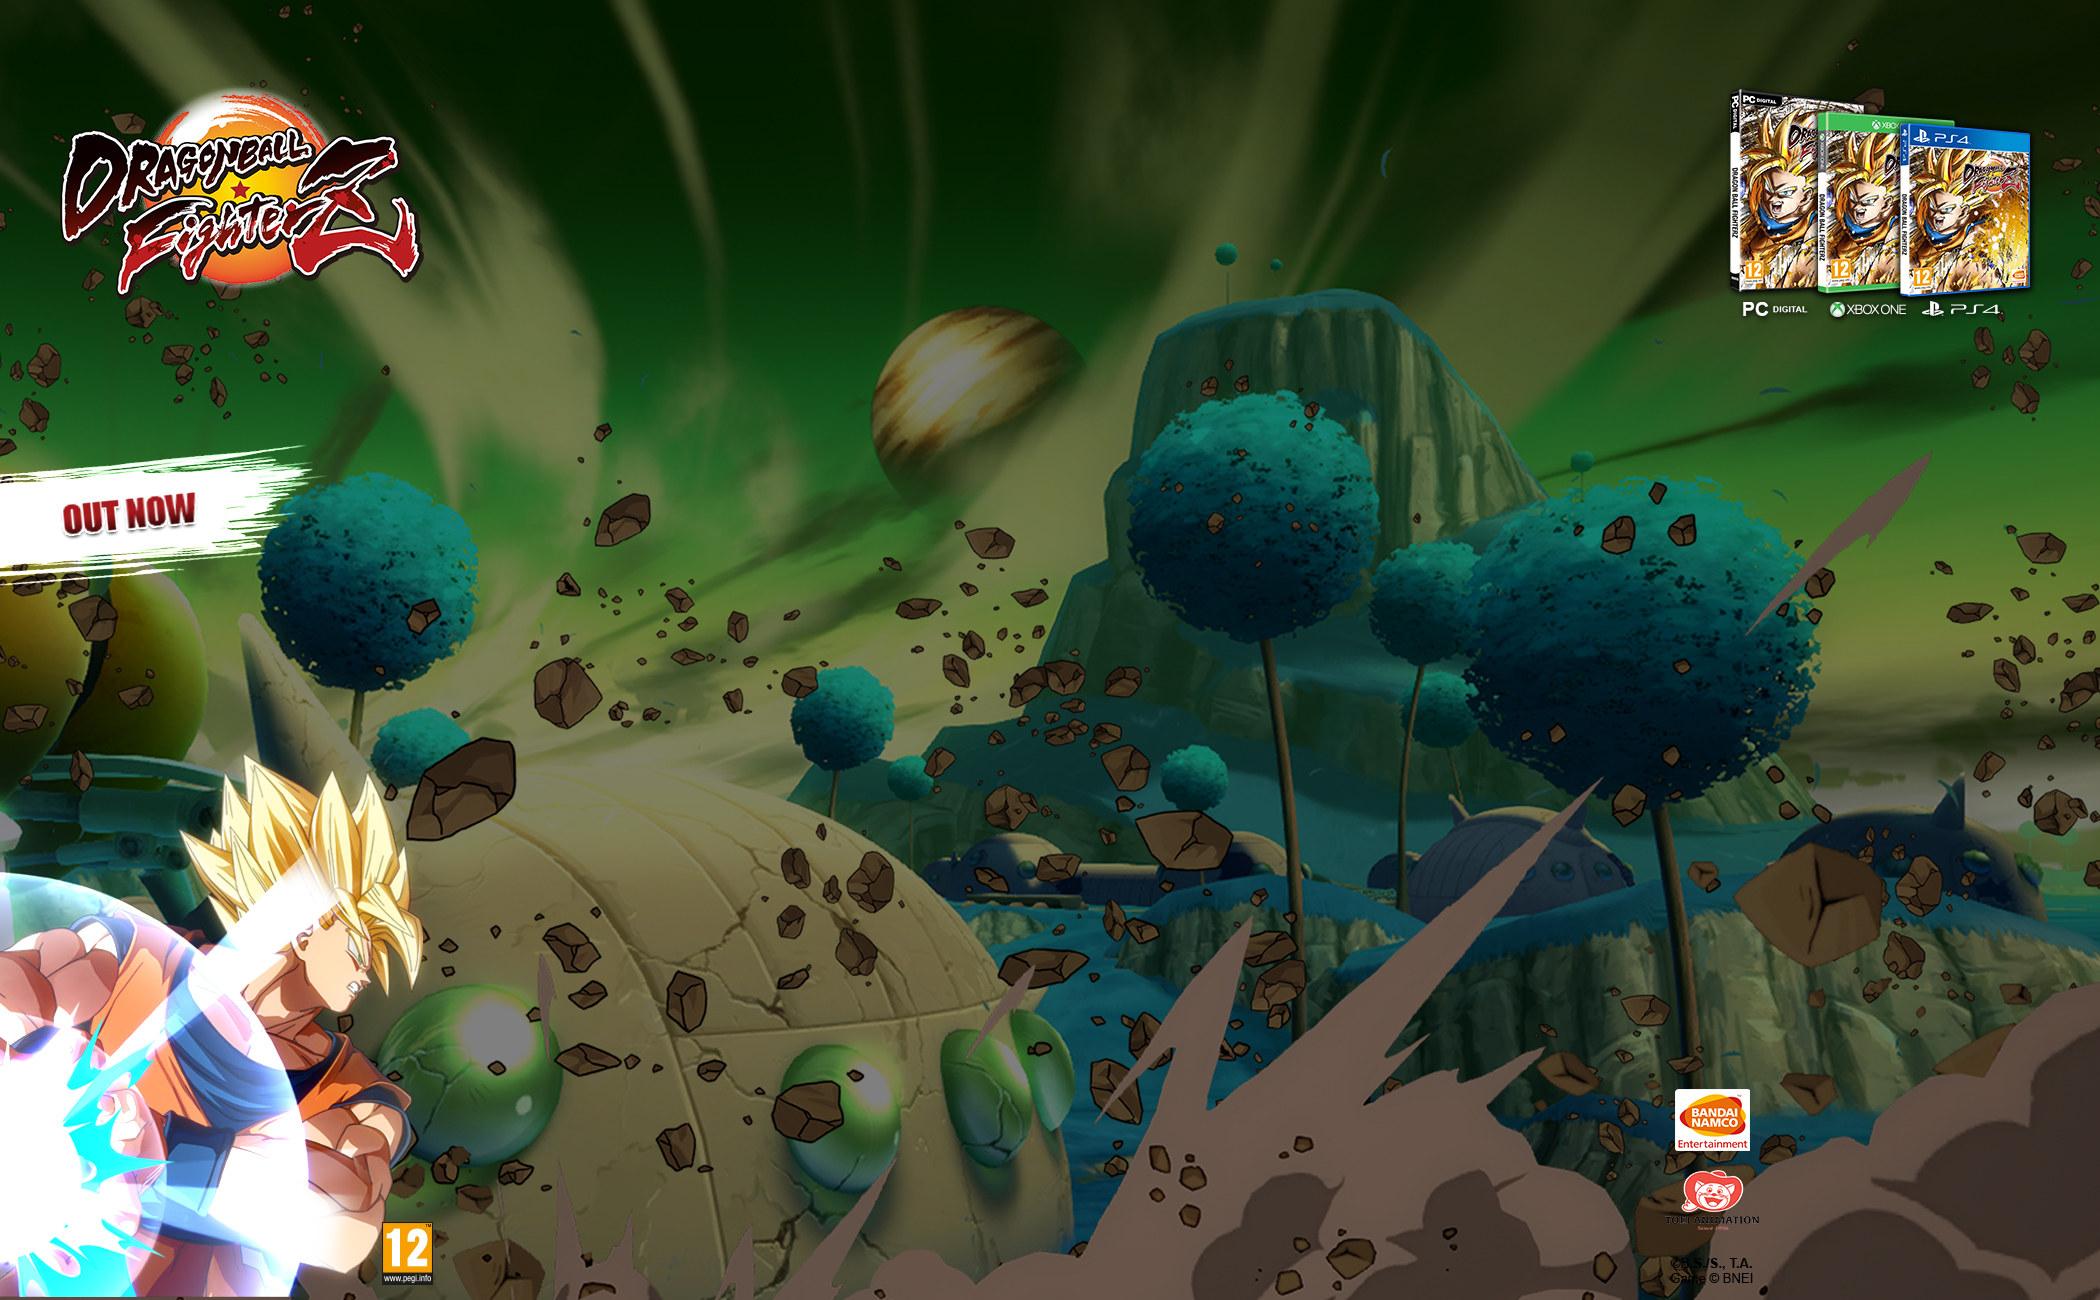 Background Skin Ad (Bandai Namco) - Πλαίσιο